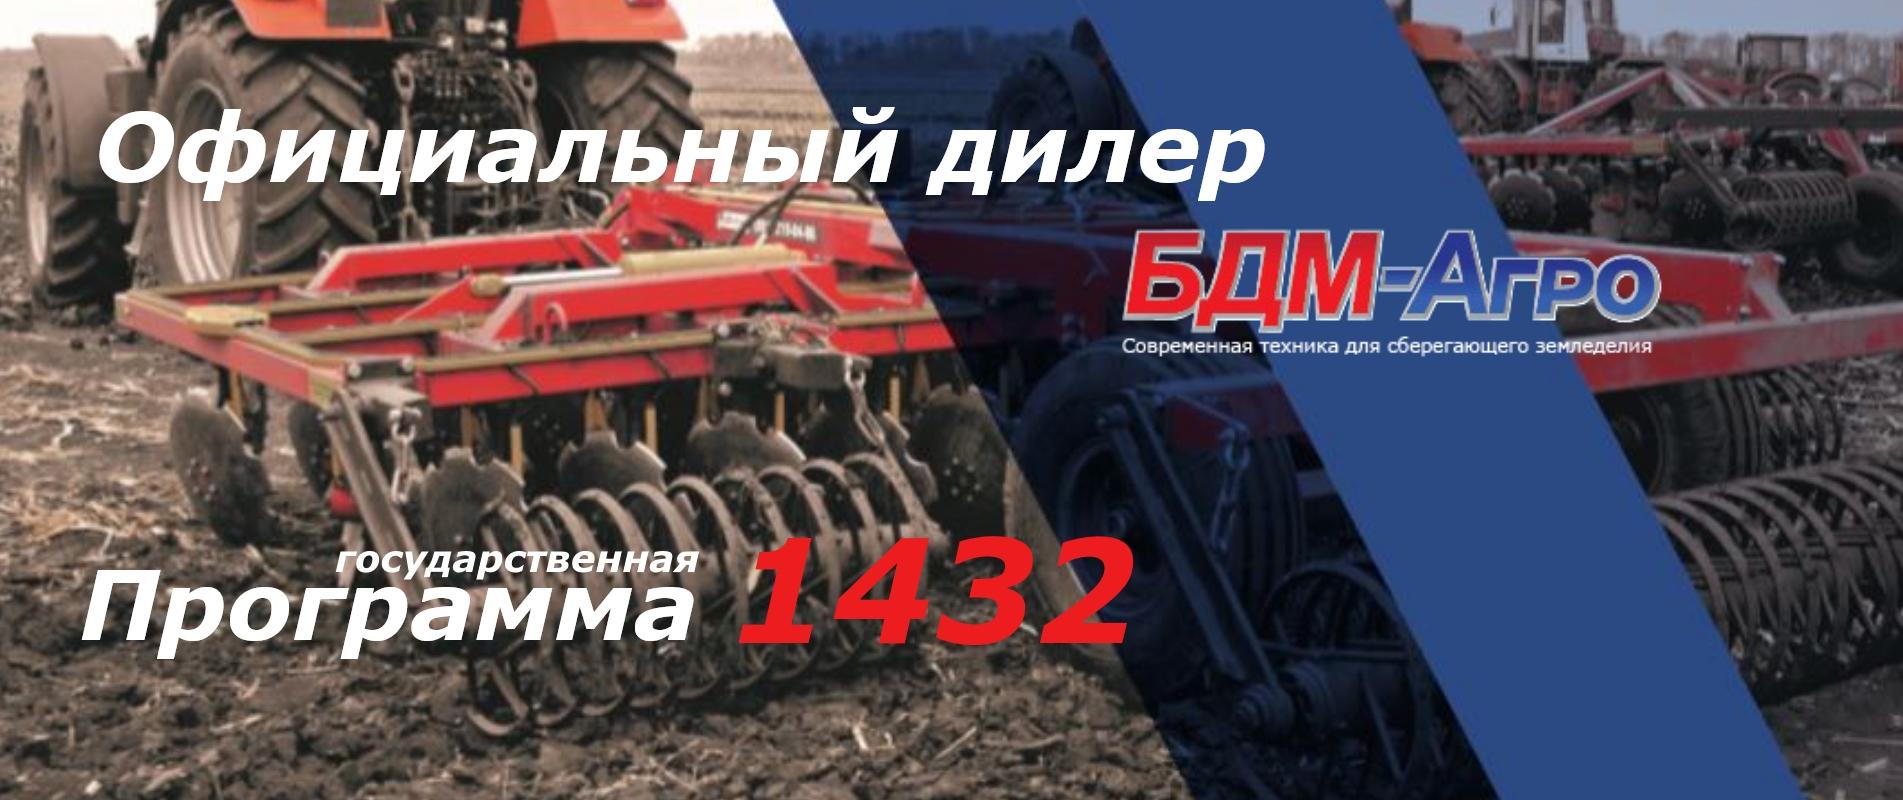 Дилеры БДМ-агро программа 1432